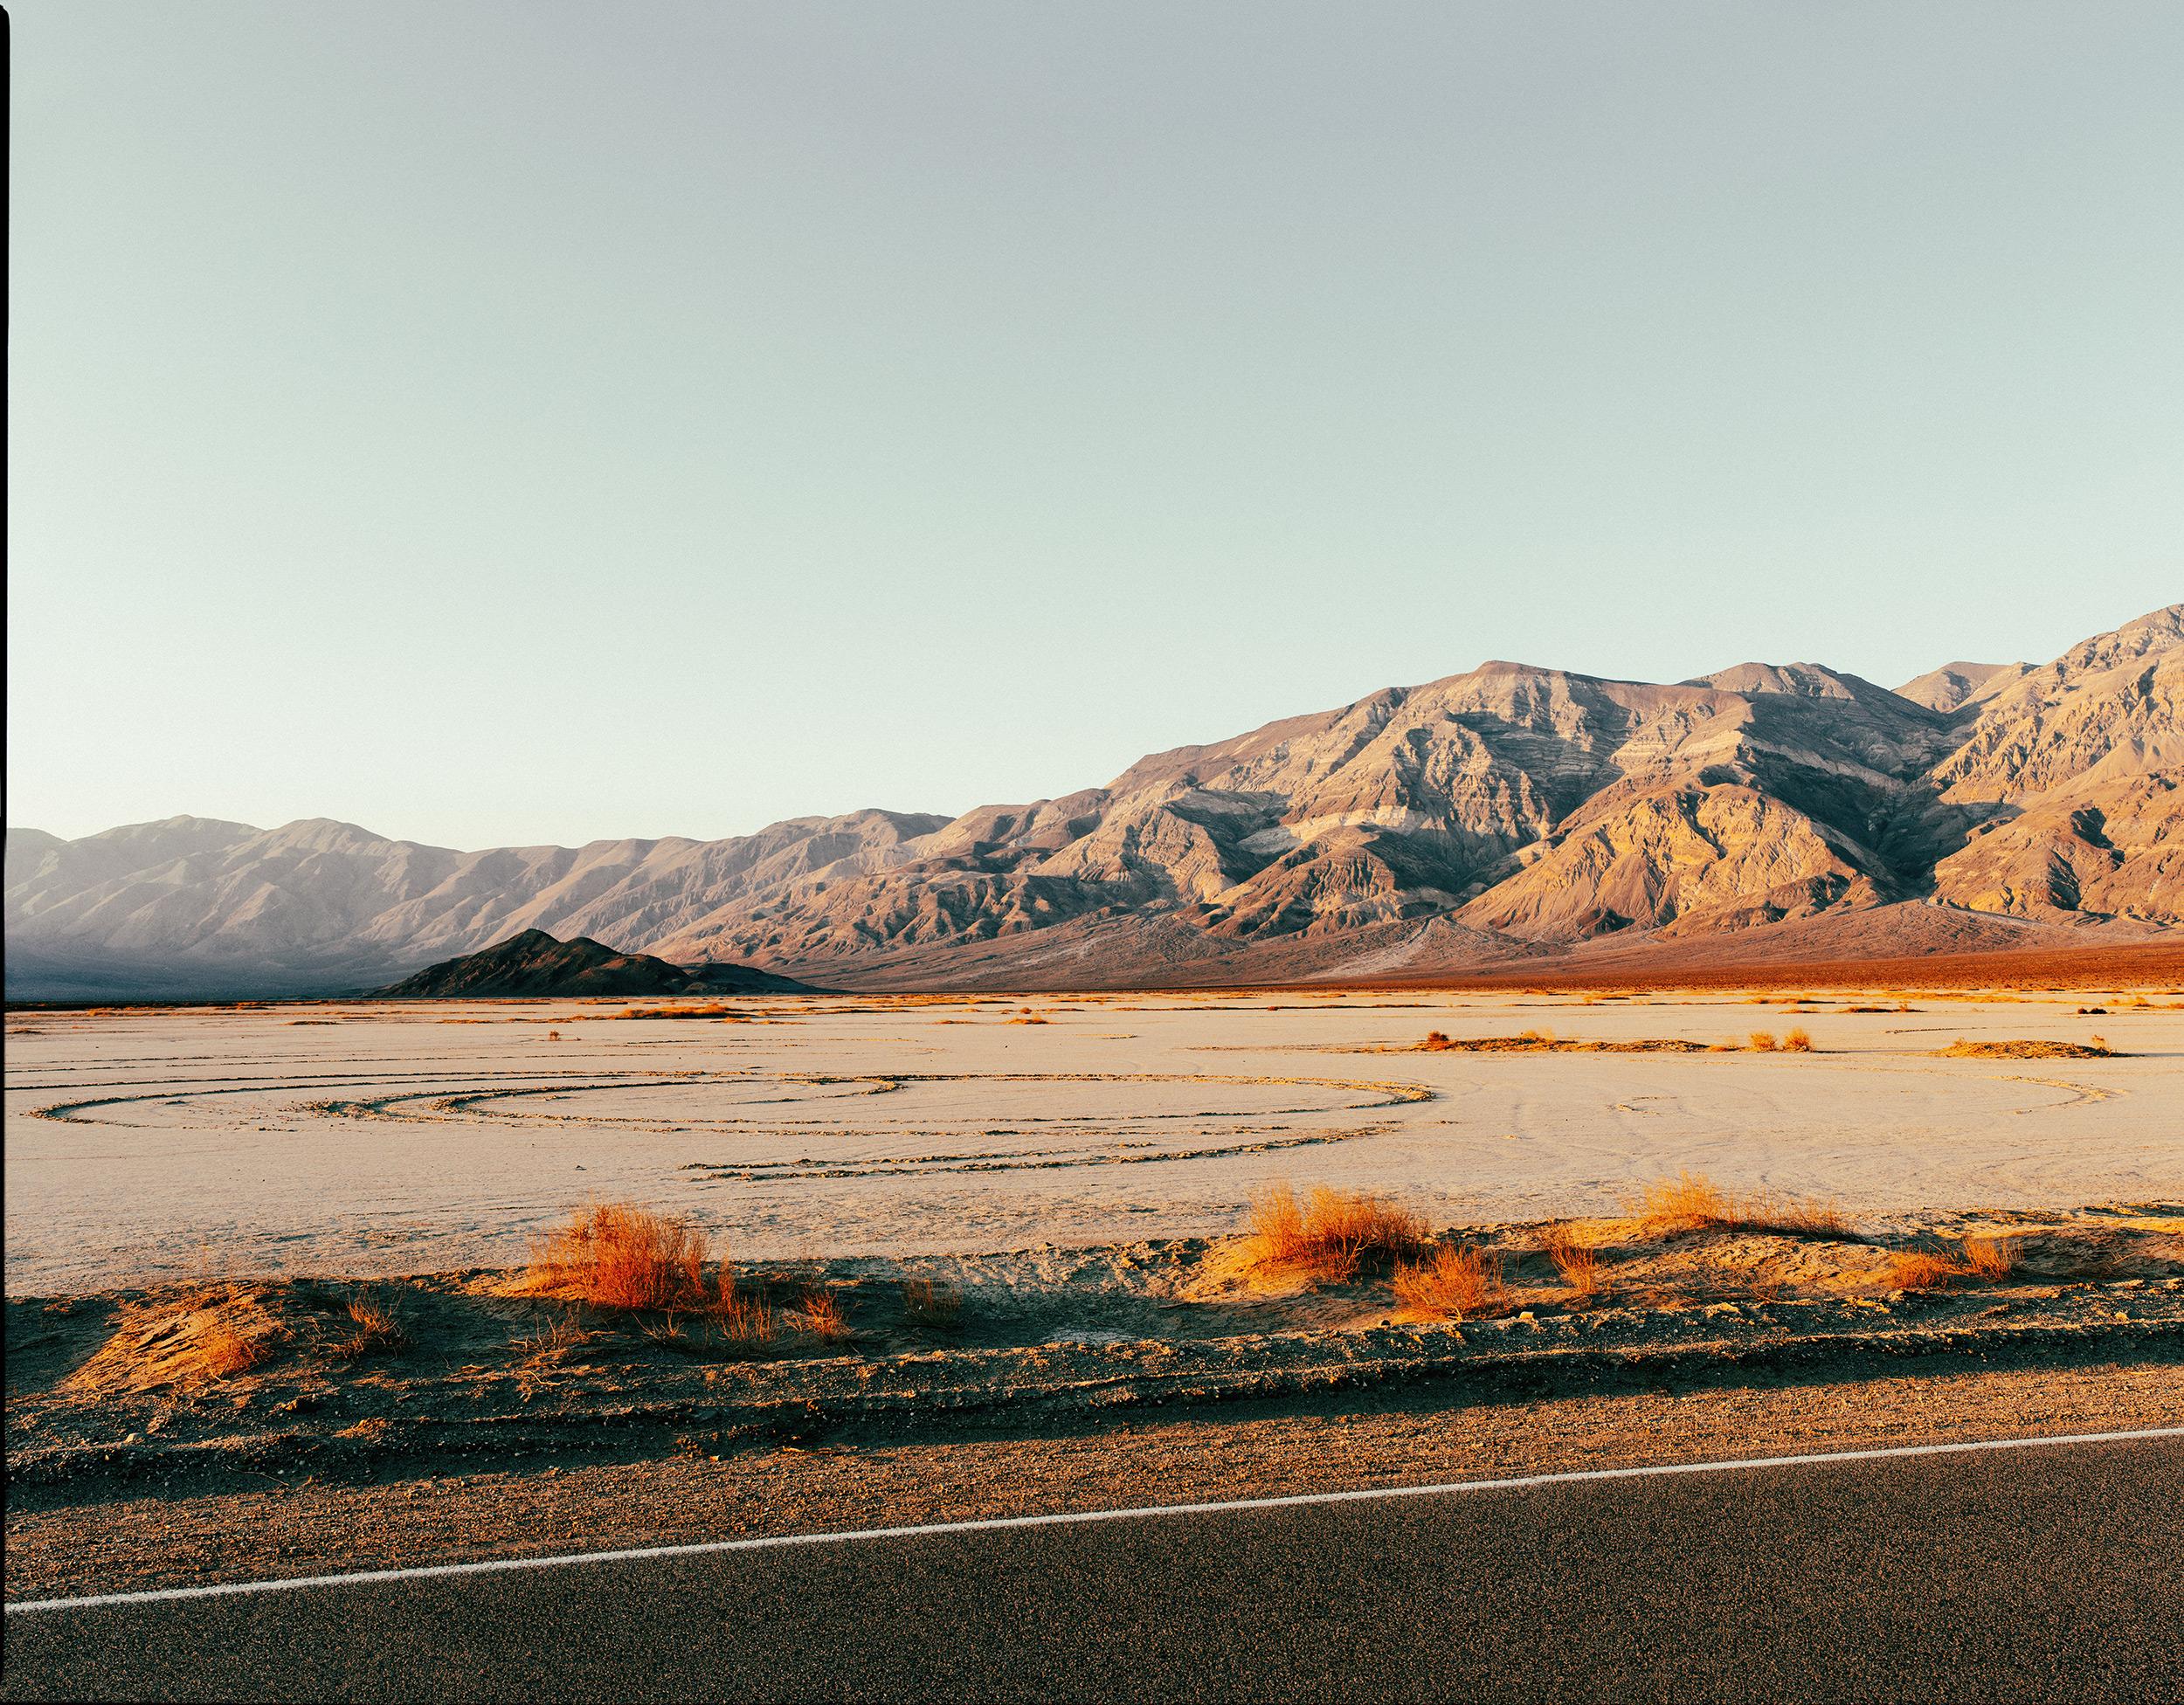 Panamint Springs, CA